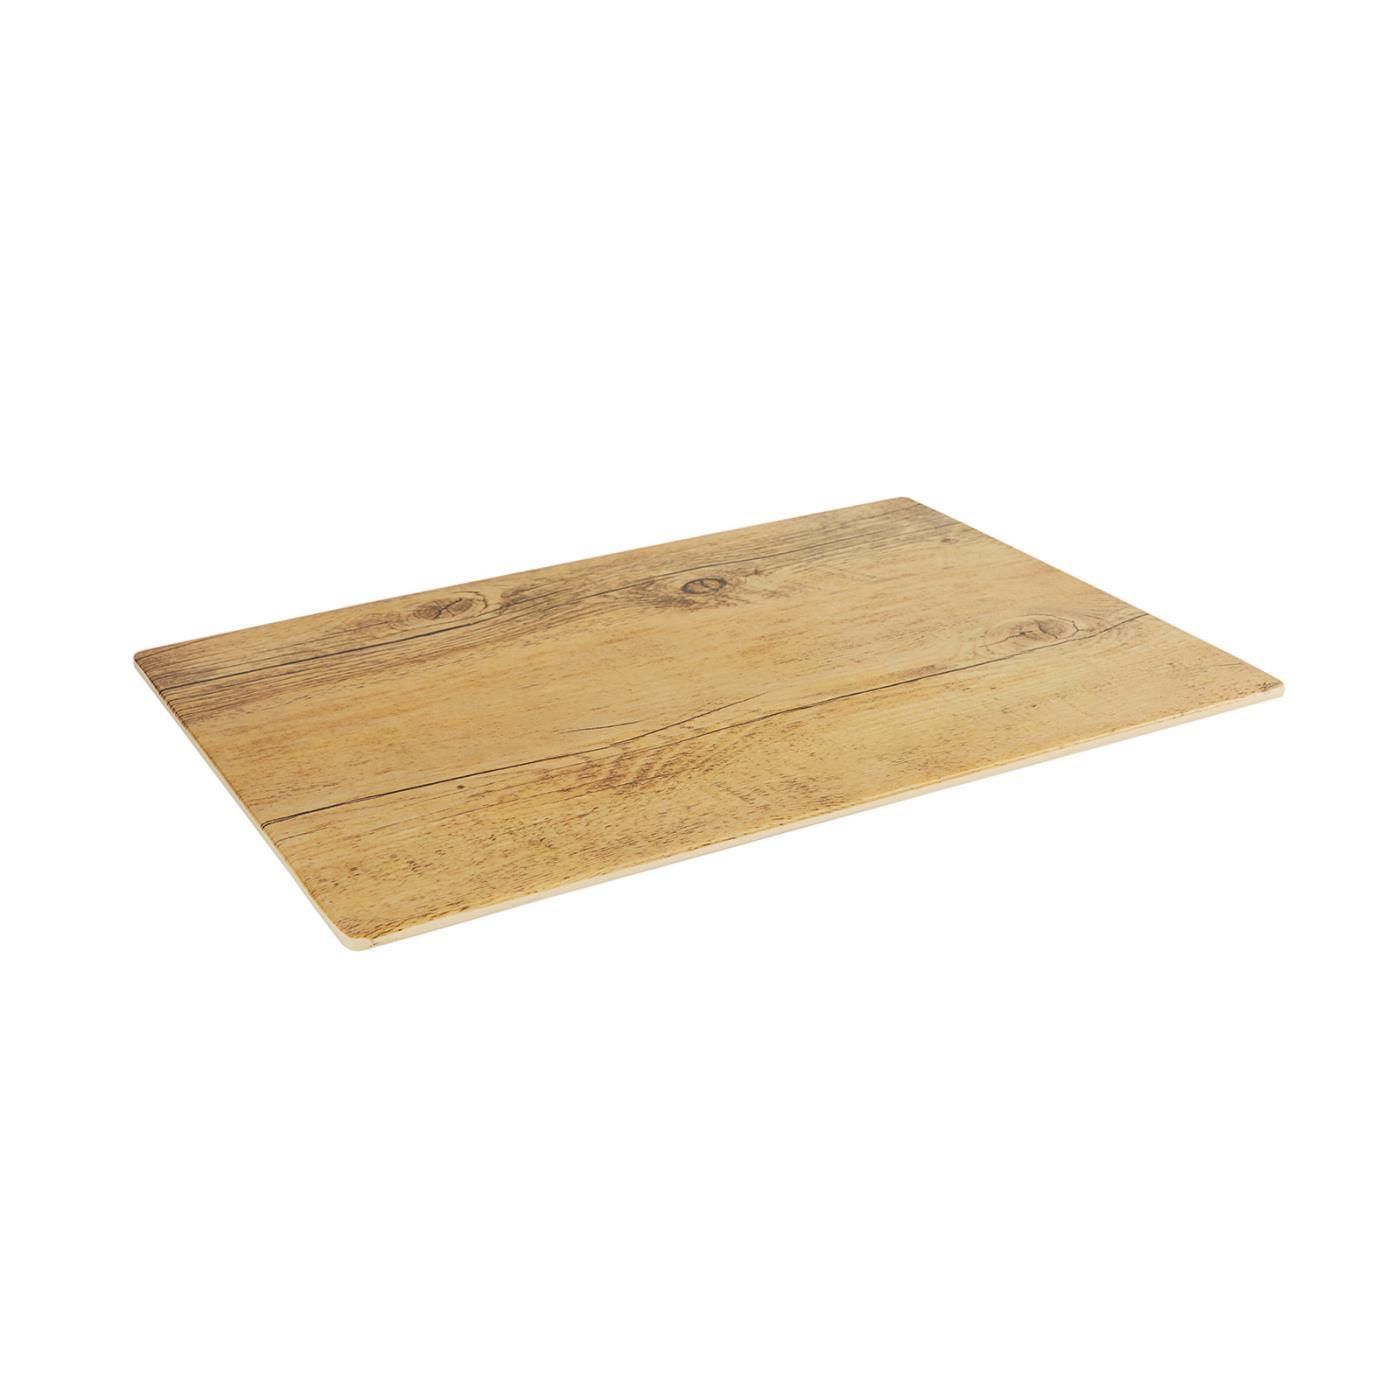 "Wood Plank - 14"" x 10"""